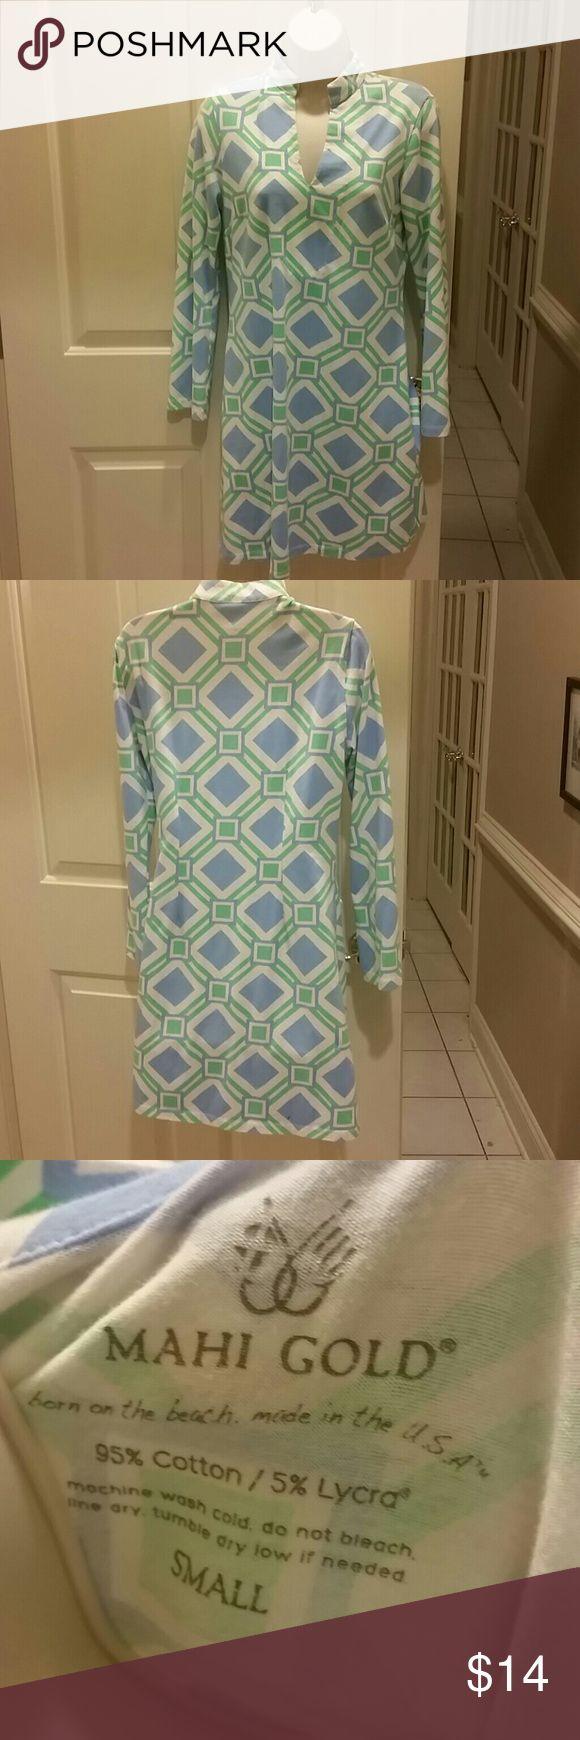 Mahi gold beach dress Blue and green geometric pattern beach dress coverup.  95% cotton 5% lycra.  Very soft mahi gold Dresses Midi